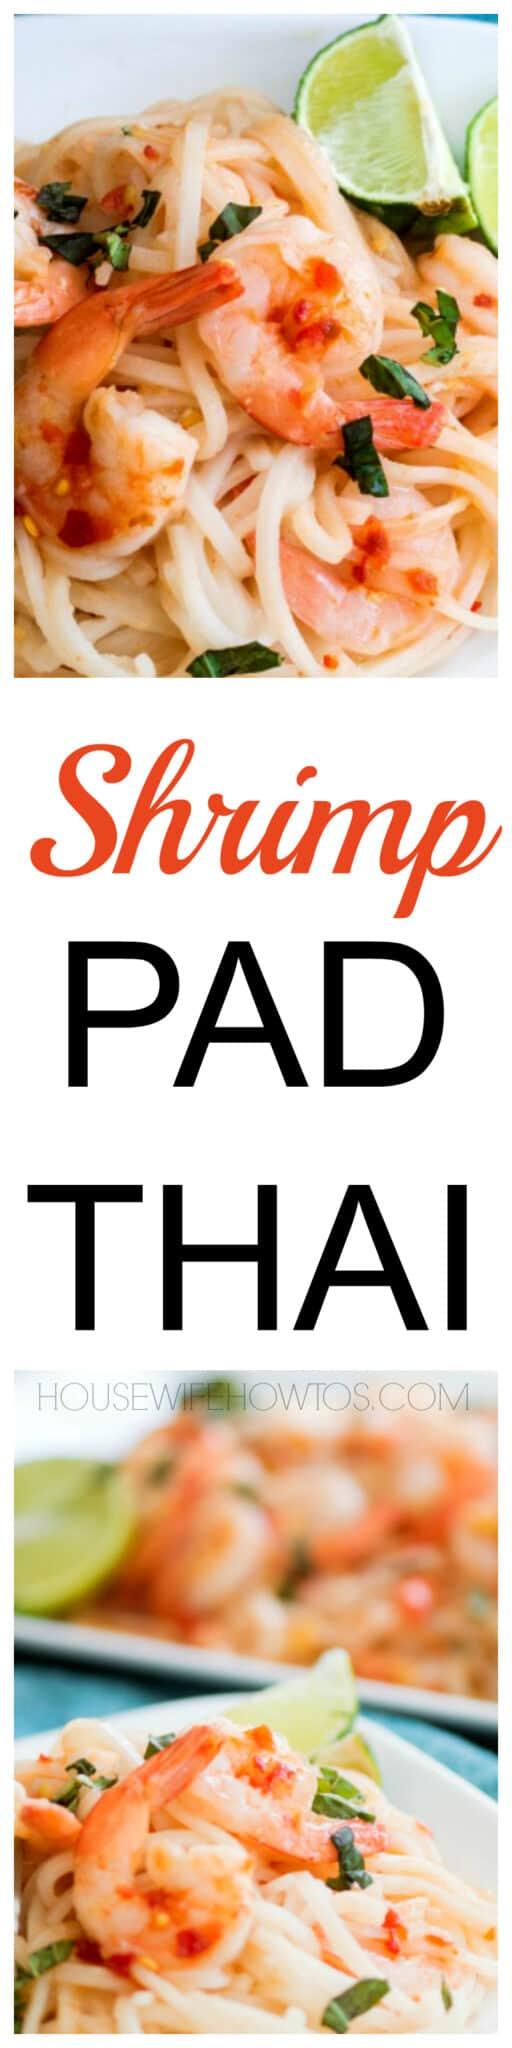 Shrimp Pad Thai Recipe - Authentic flavor in less time than takeout! #padthai #asianflavor #shrimp #noodles #easydinnerrecipe #takeoutfakeout